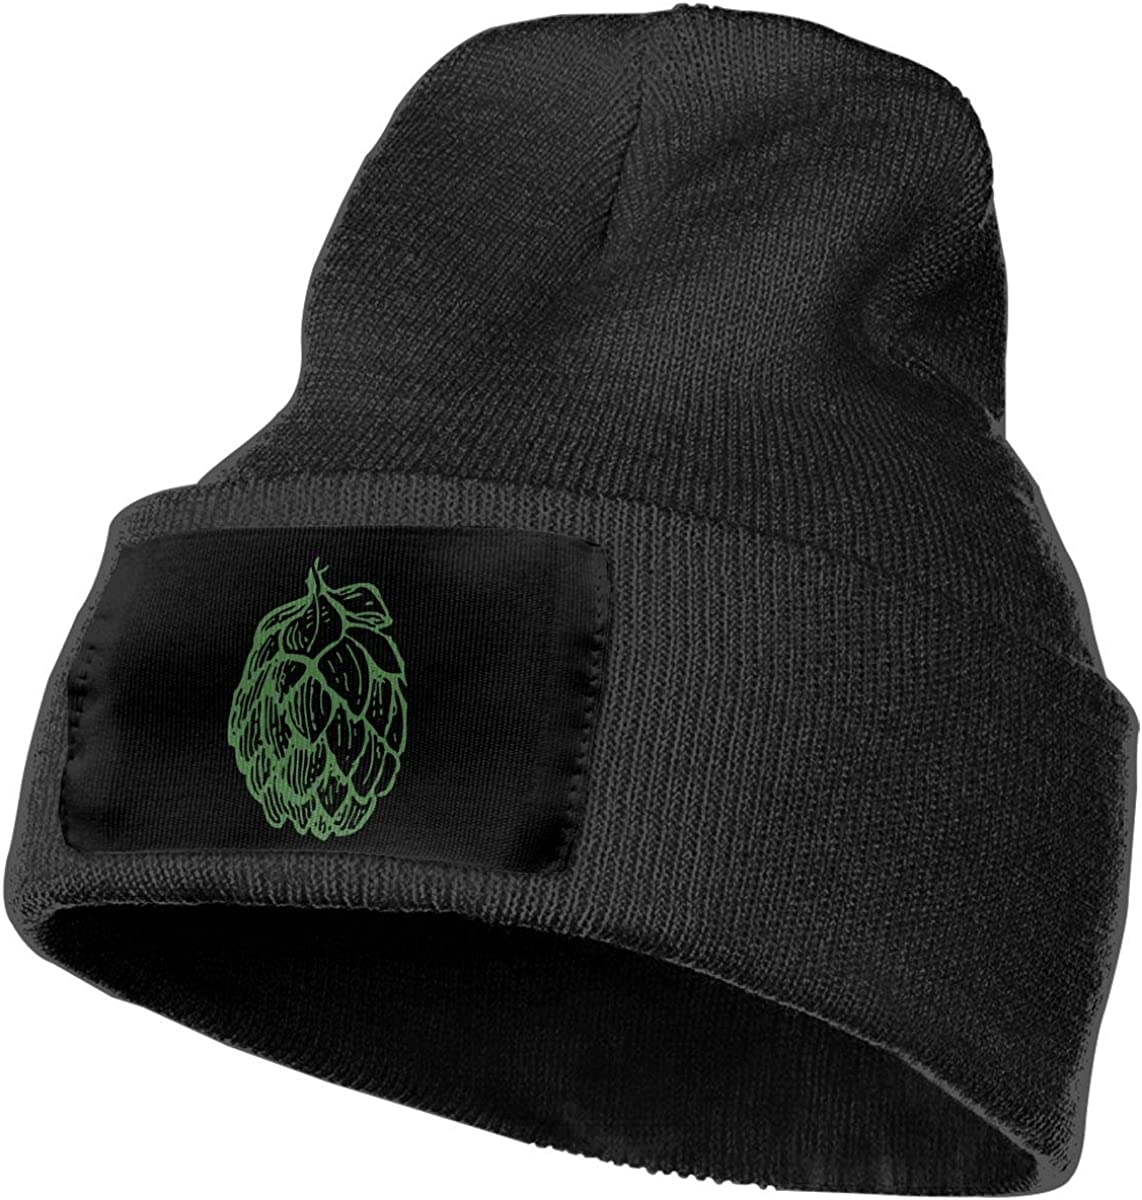 COLLJL-8 Men//Women Beer Hops Outdoor Warm Knit Beanies Hat Soft Winter Knit Caps